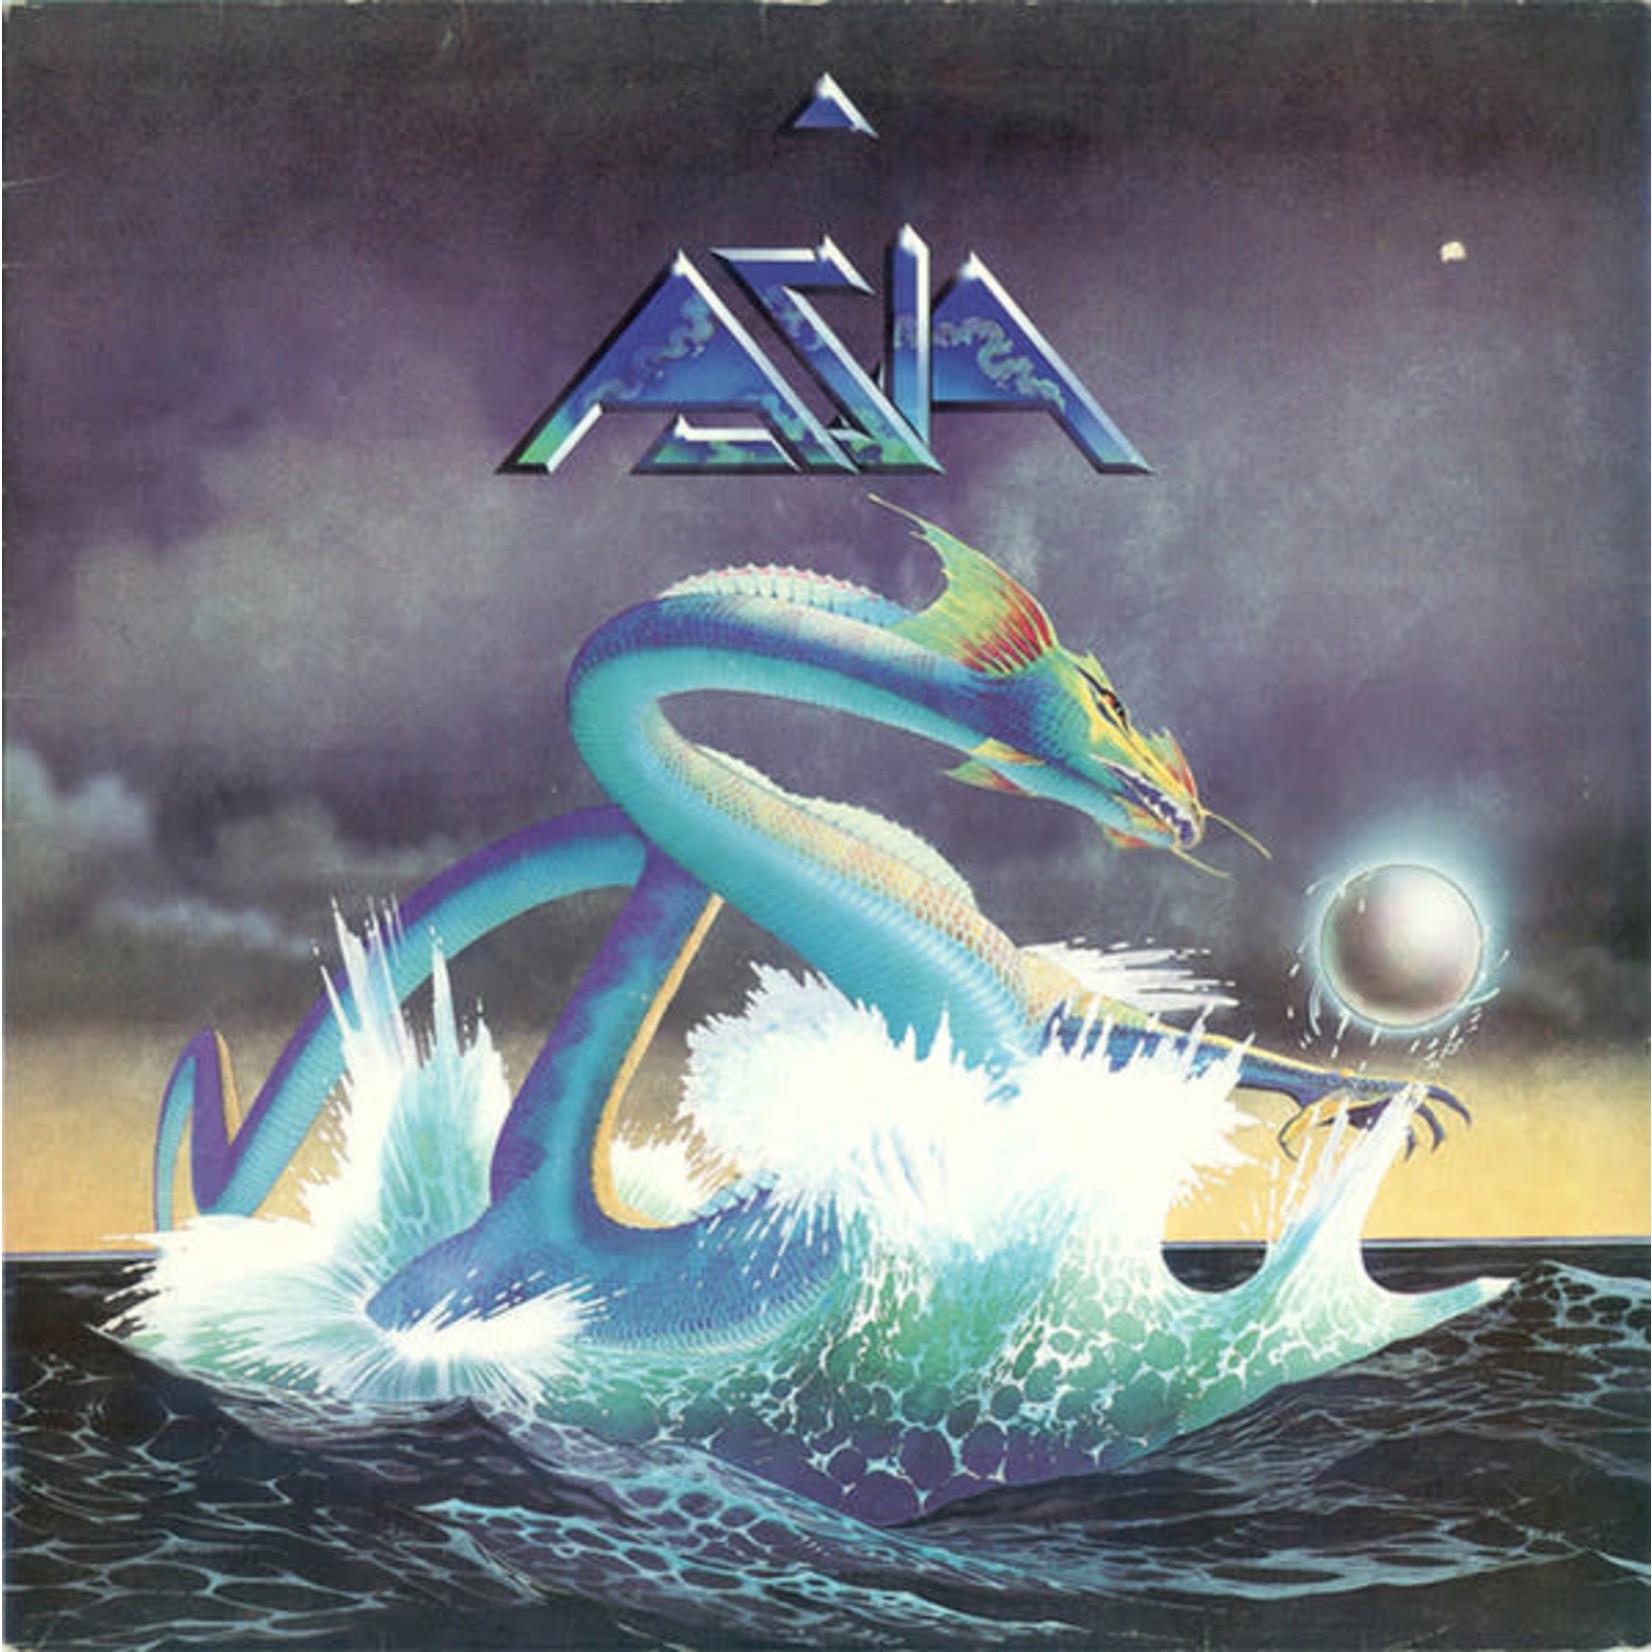 [Vintage] Asia: self-titled